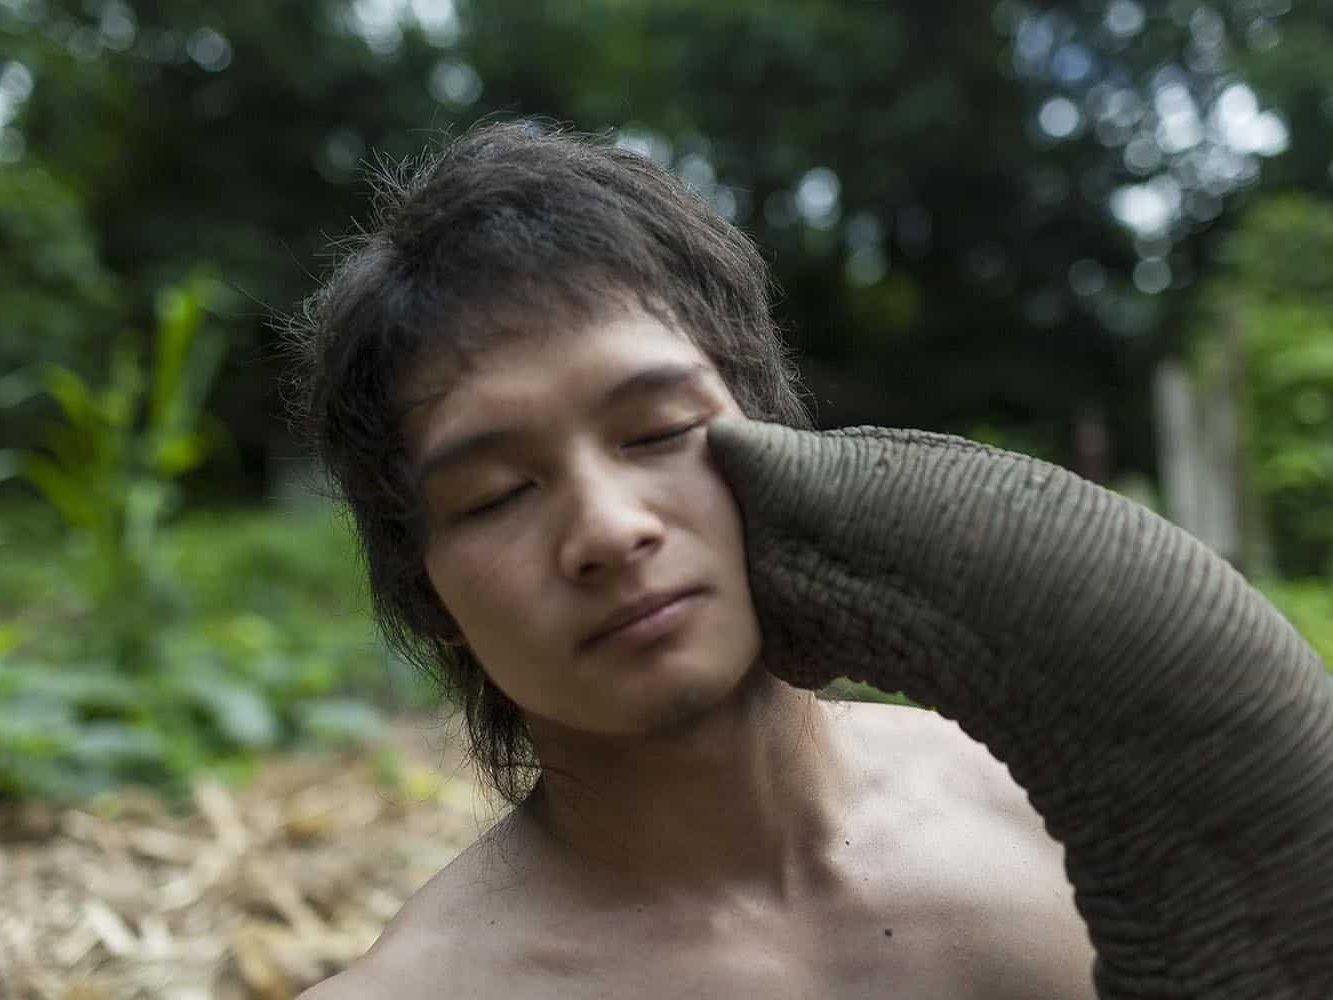 vietnam photographer mahout family binhdang 20